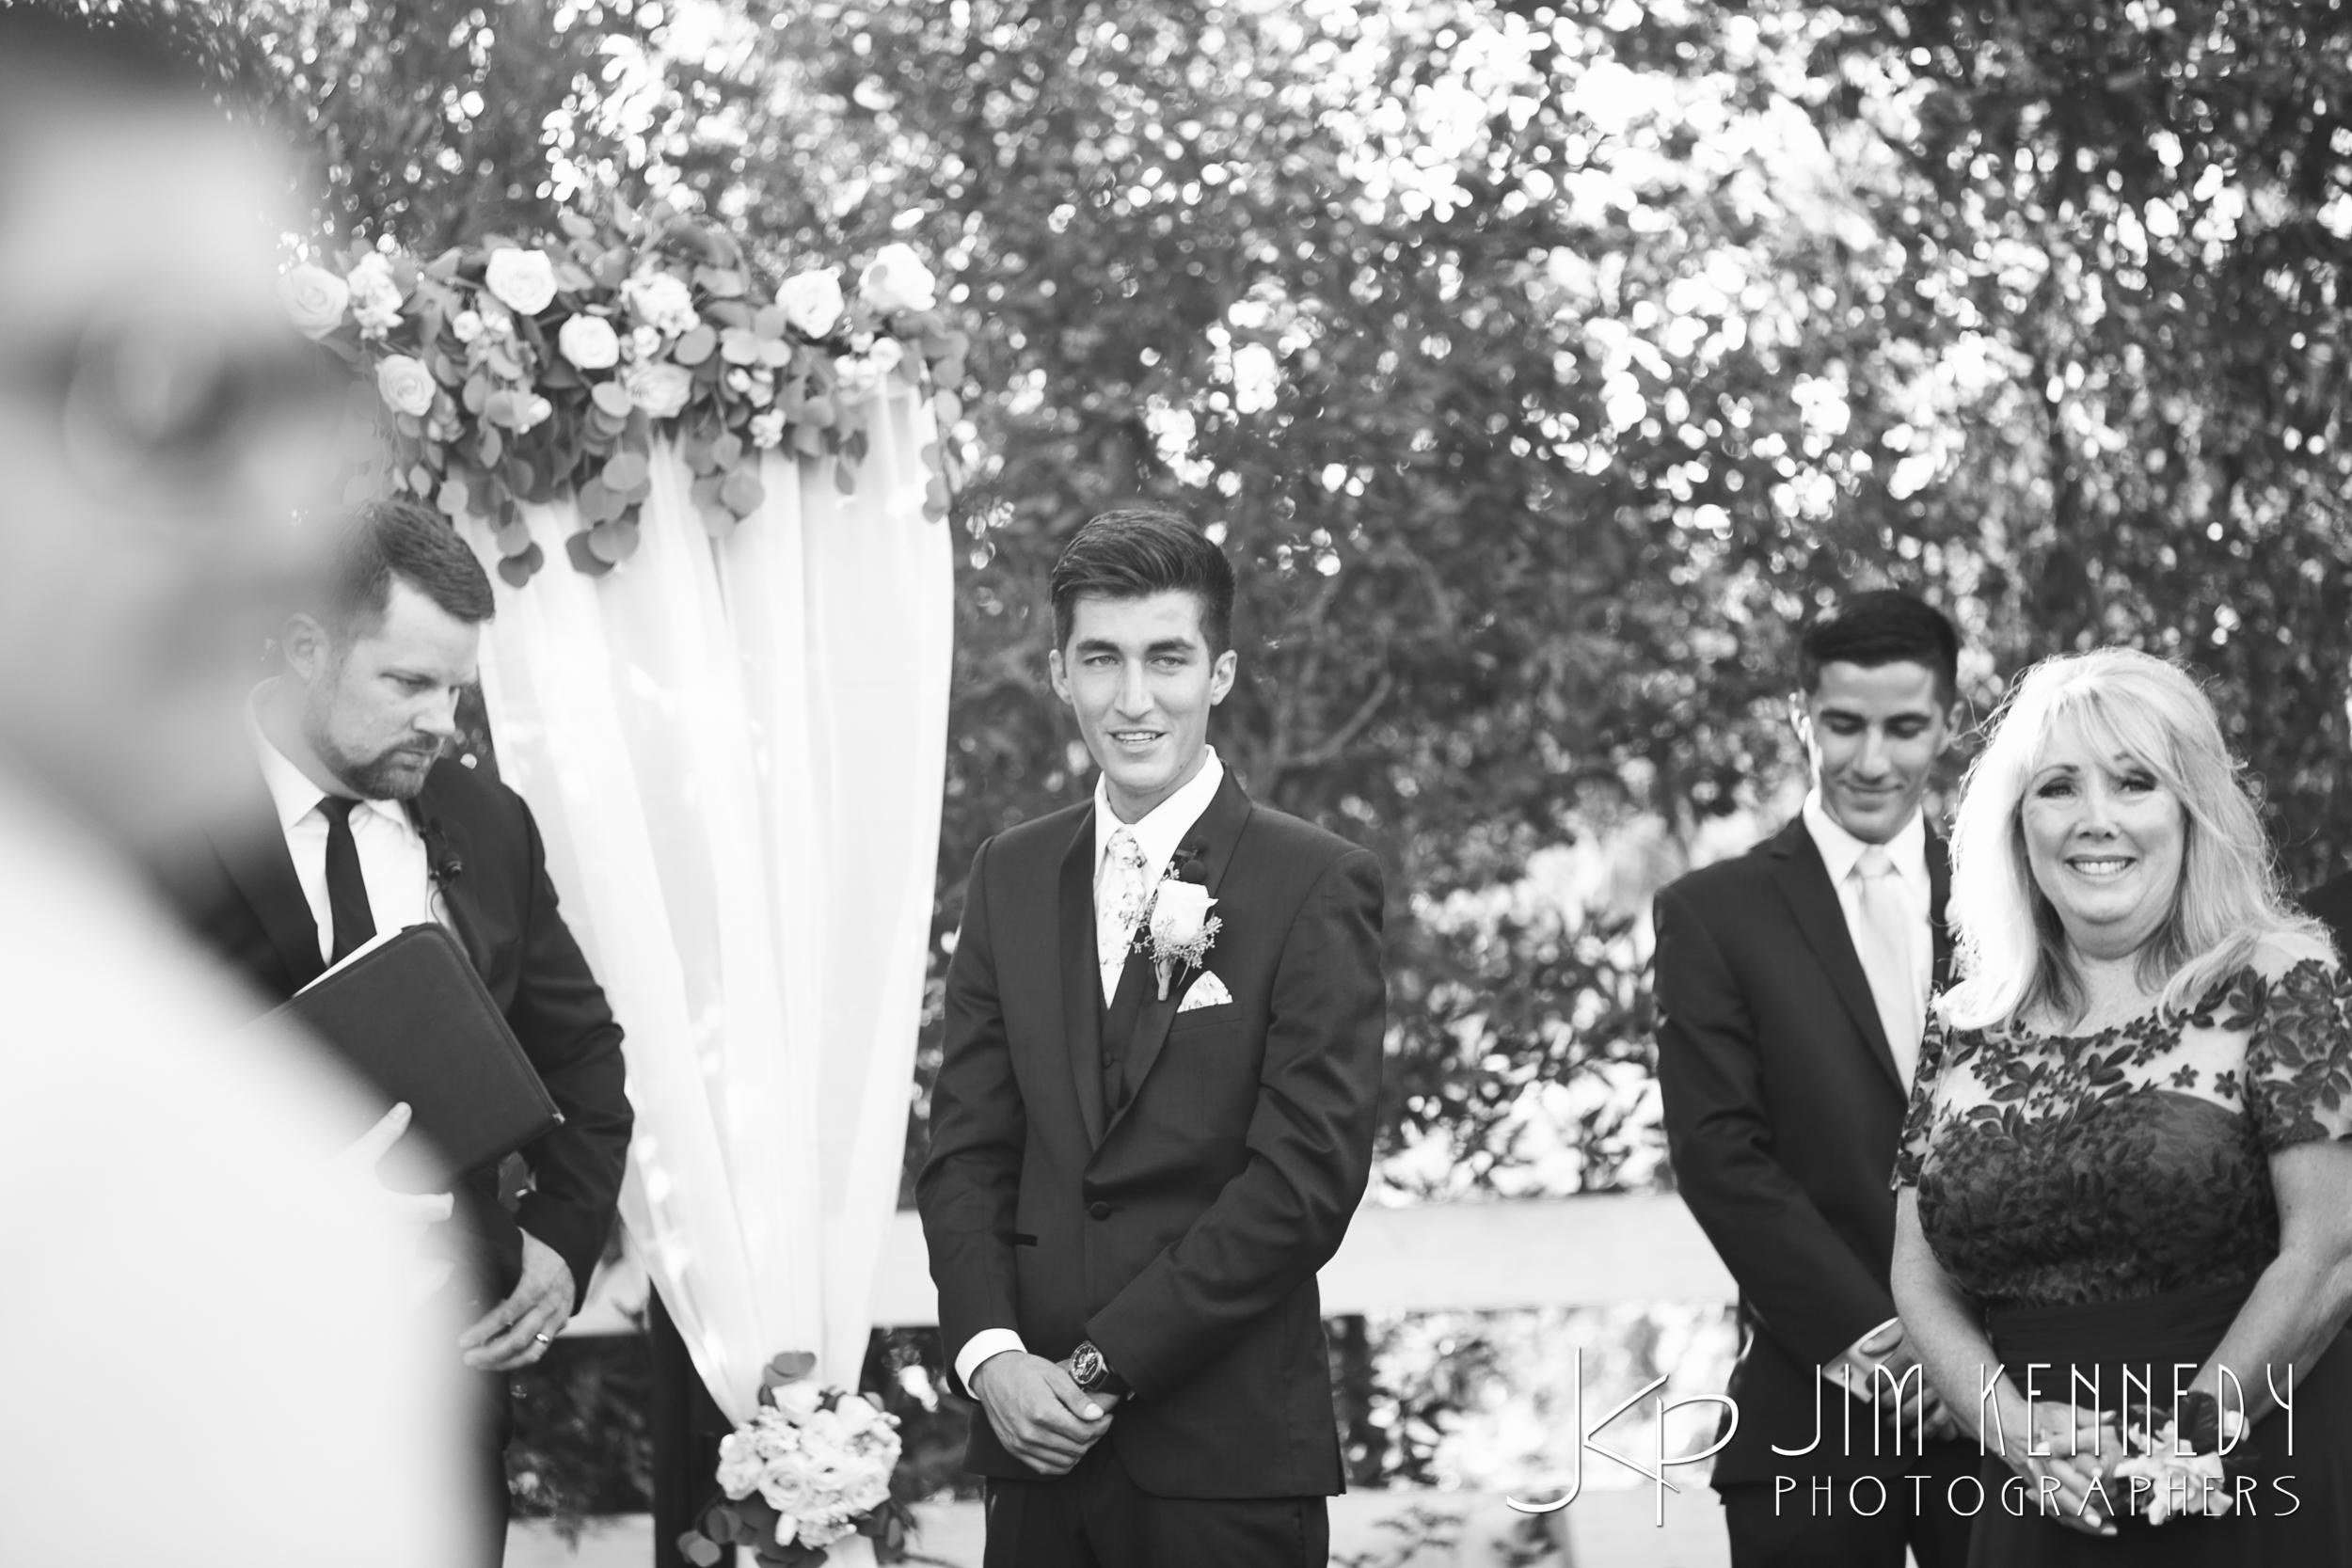 huntington_beach_wedding-3067.jpg